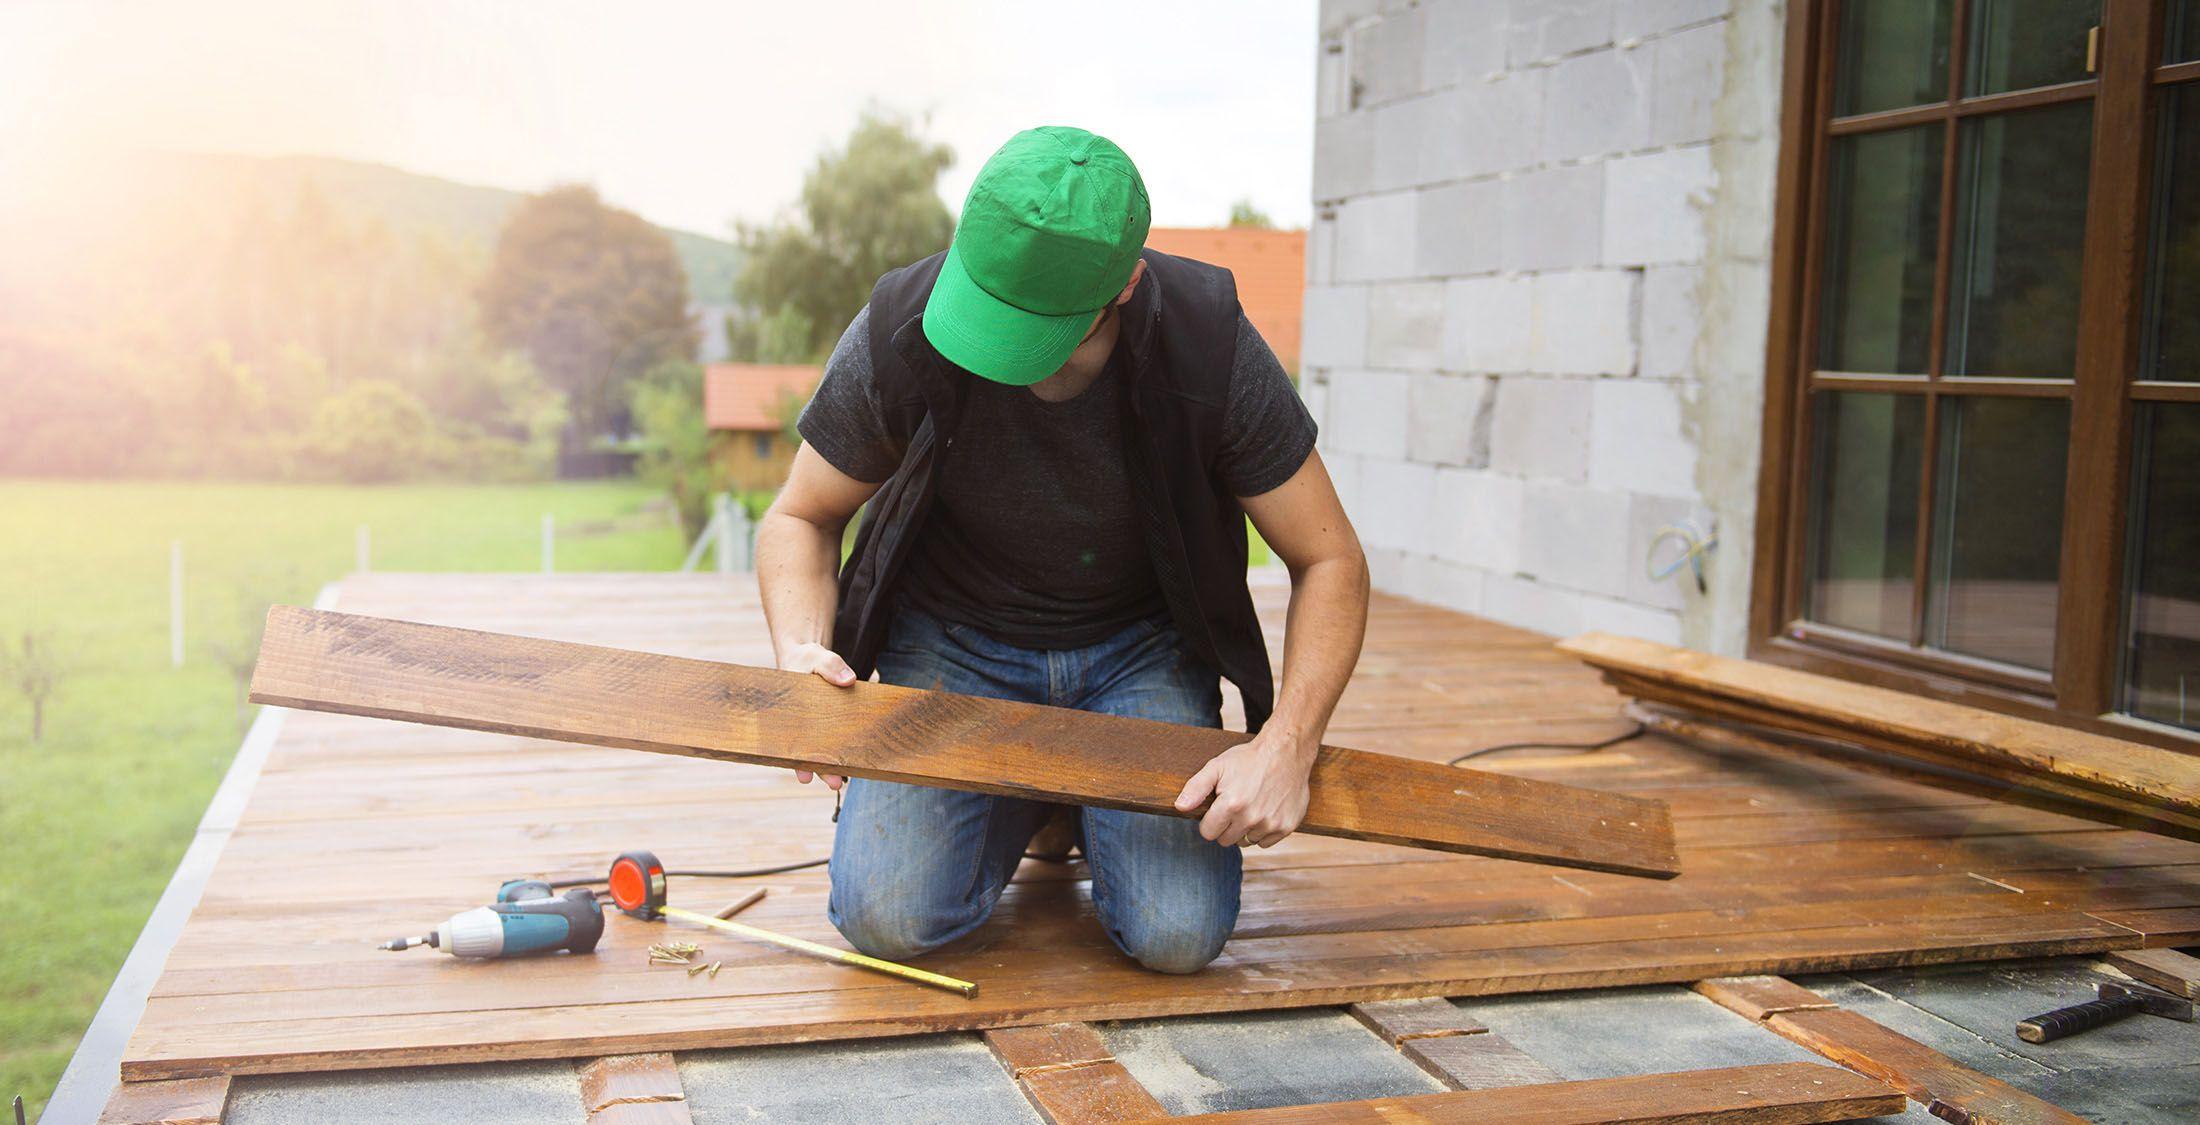 man installing new floor board on patio